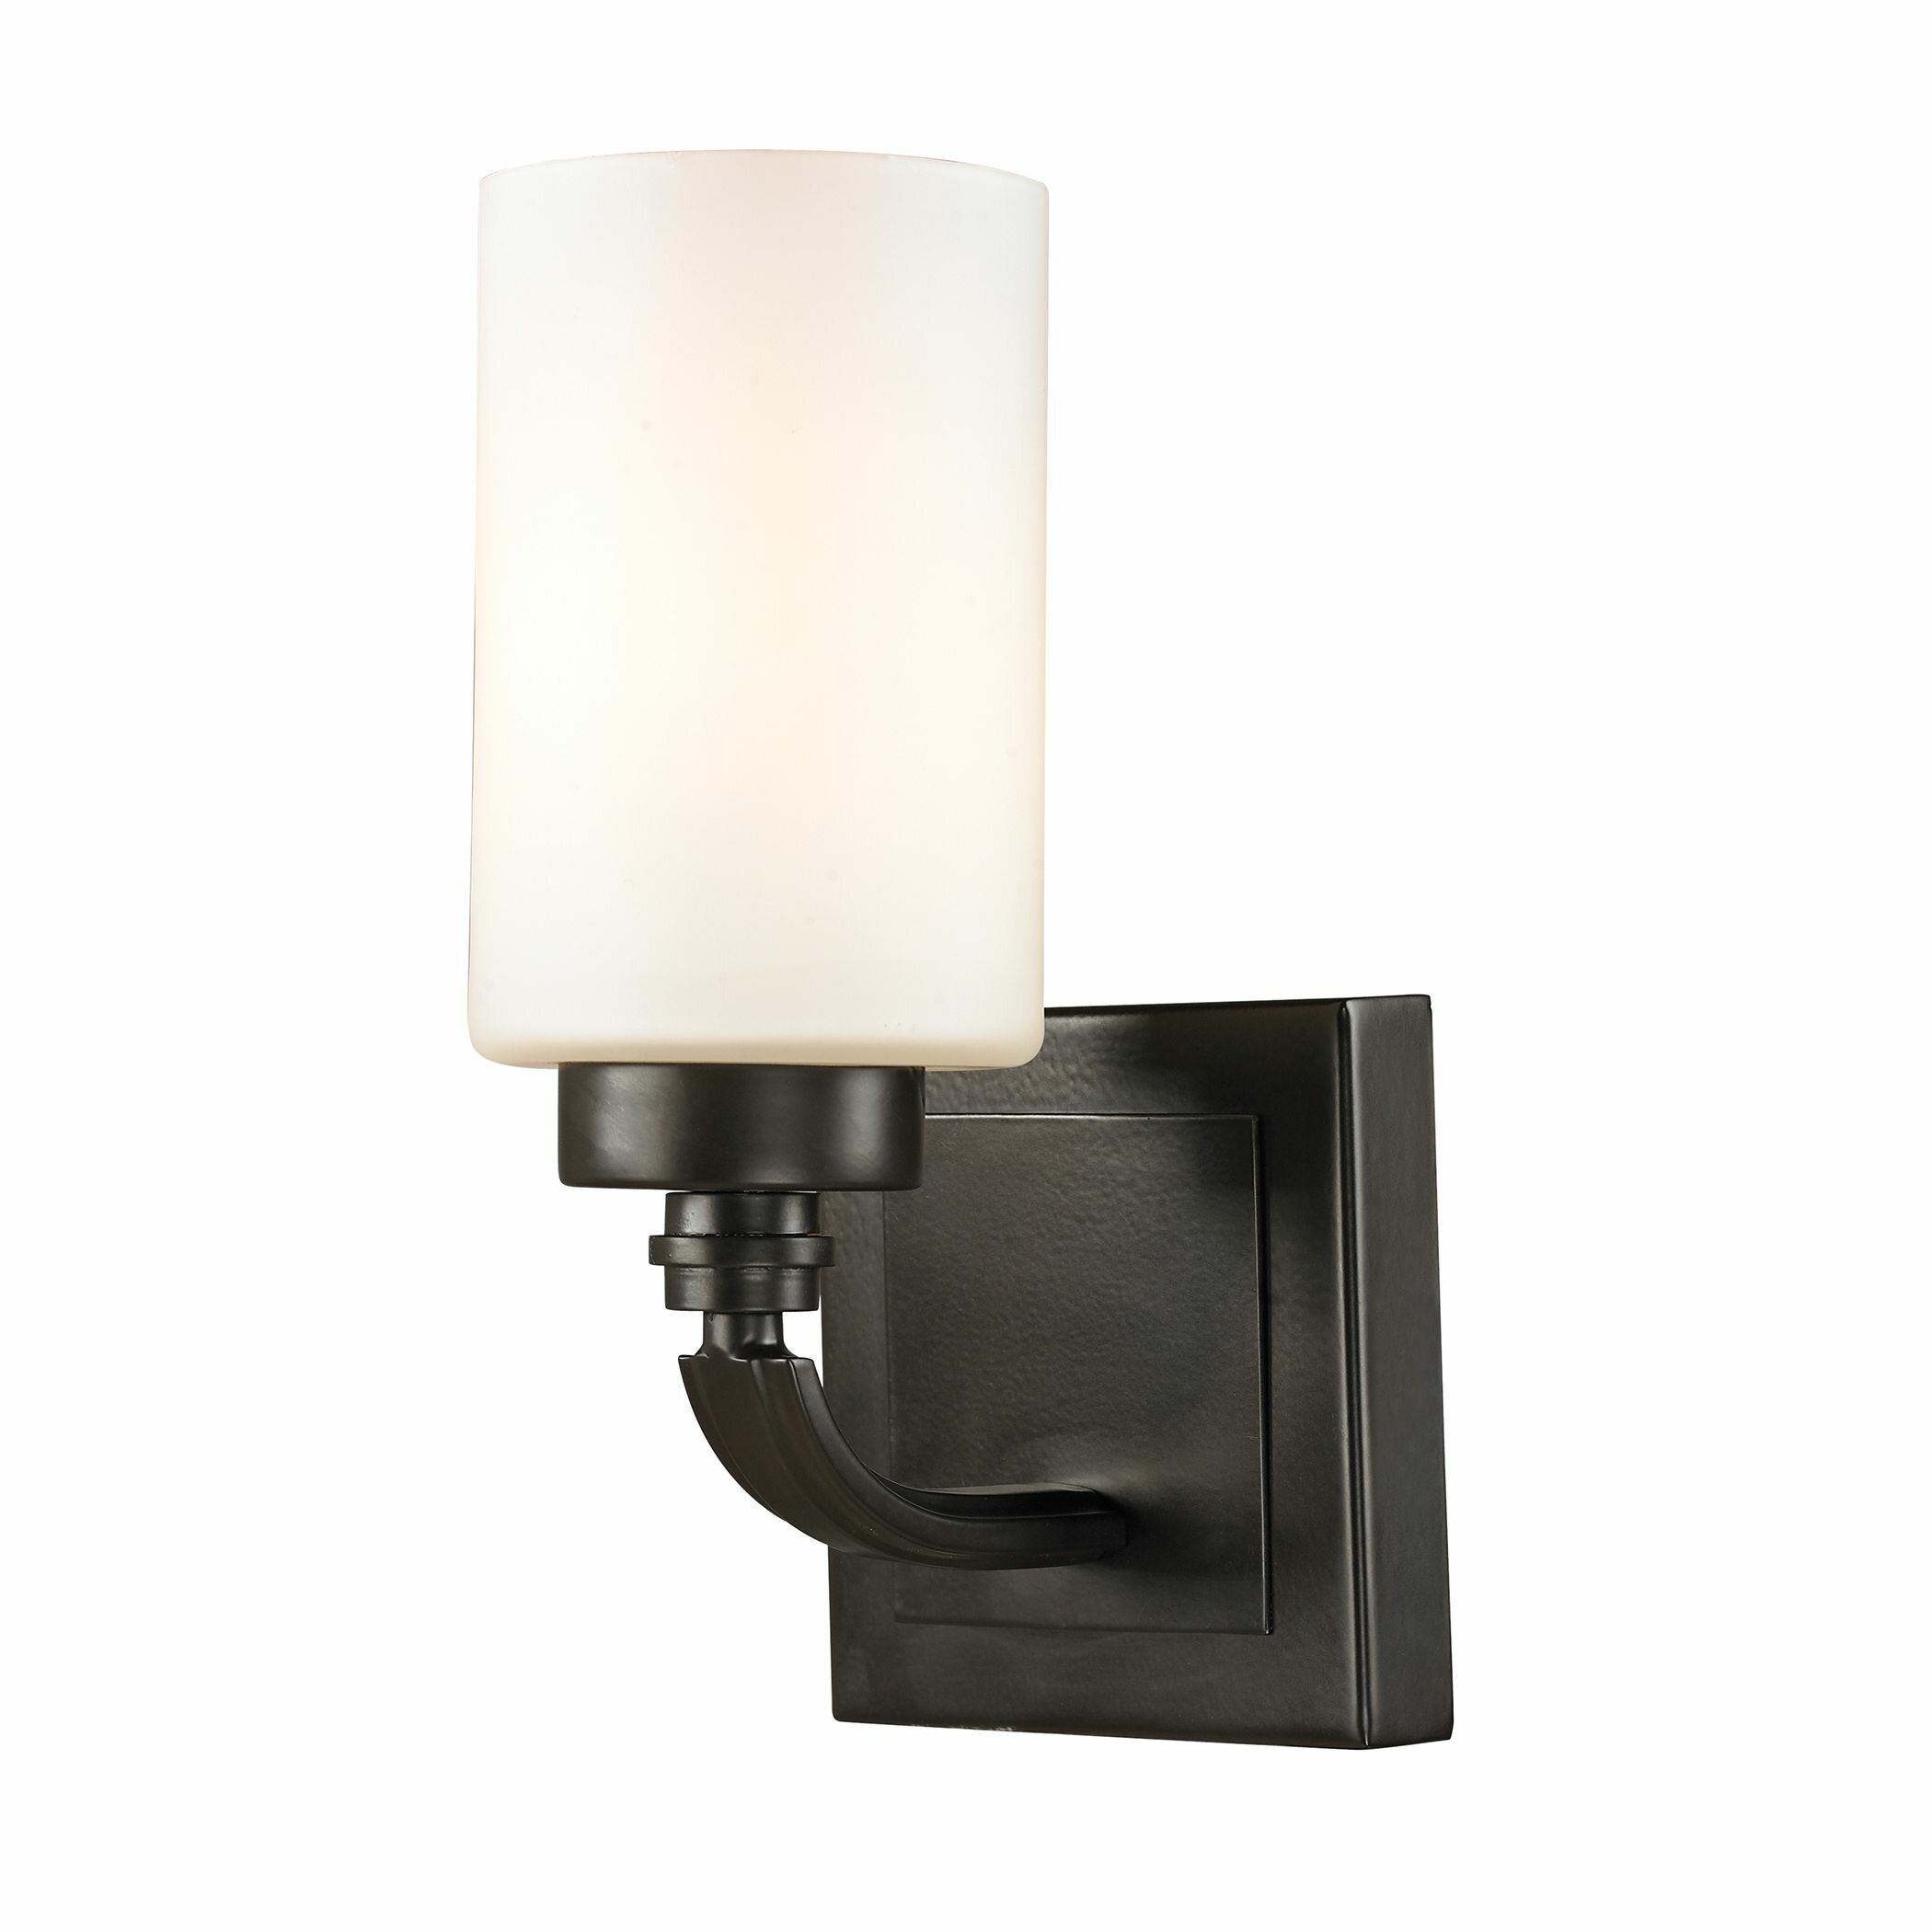 Elk lighting dawson 1 light bath vanity light reviews for Elk bathroom lighting